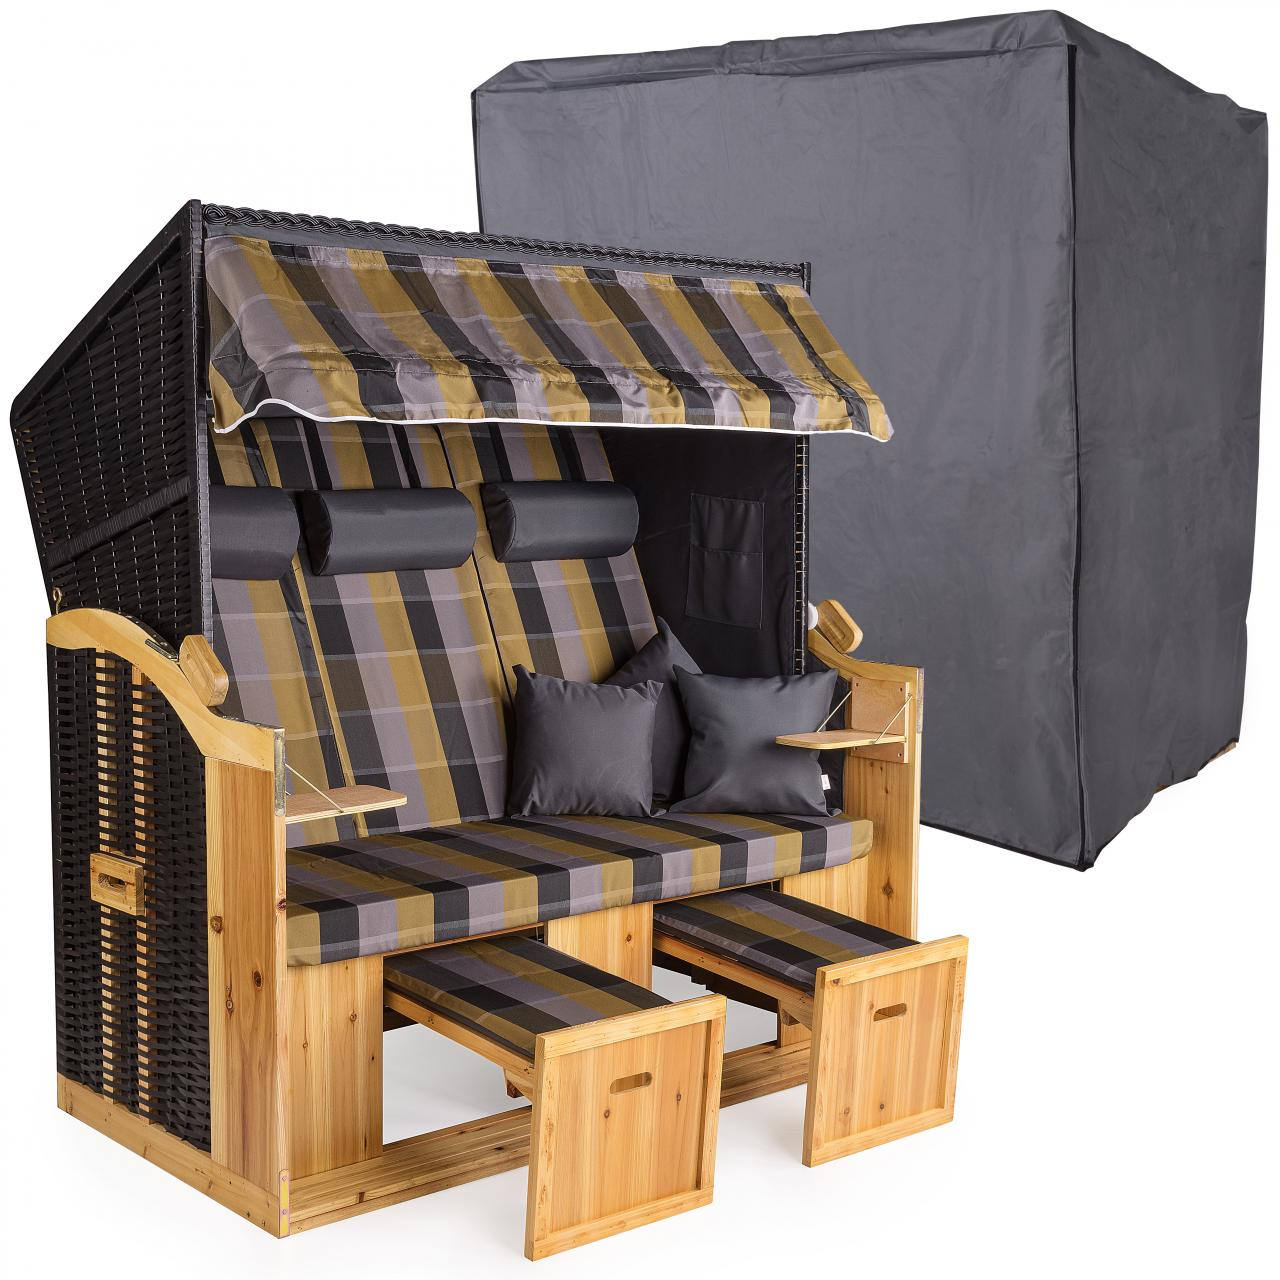 strandkorb xxl 160cm inklusive schutzh lle 600d volllieger. Black Bedroom Furniture Sets. Home Design Ideas